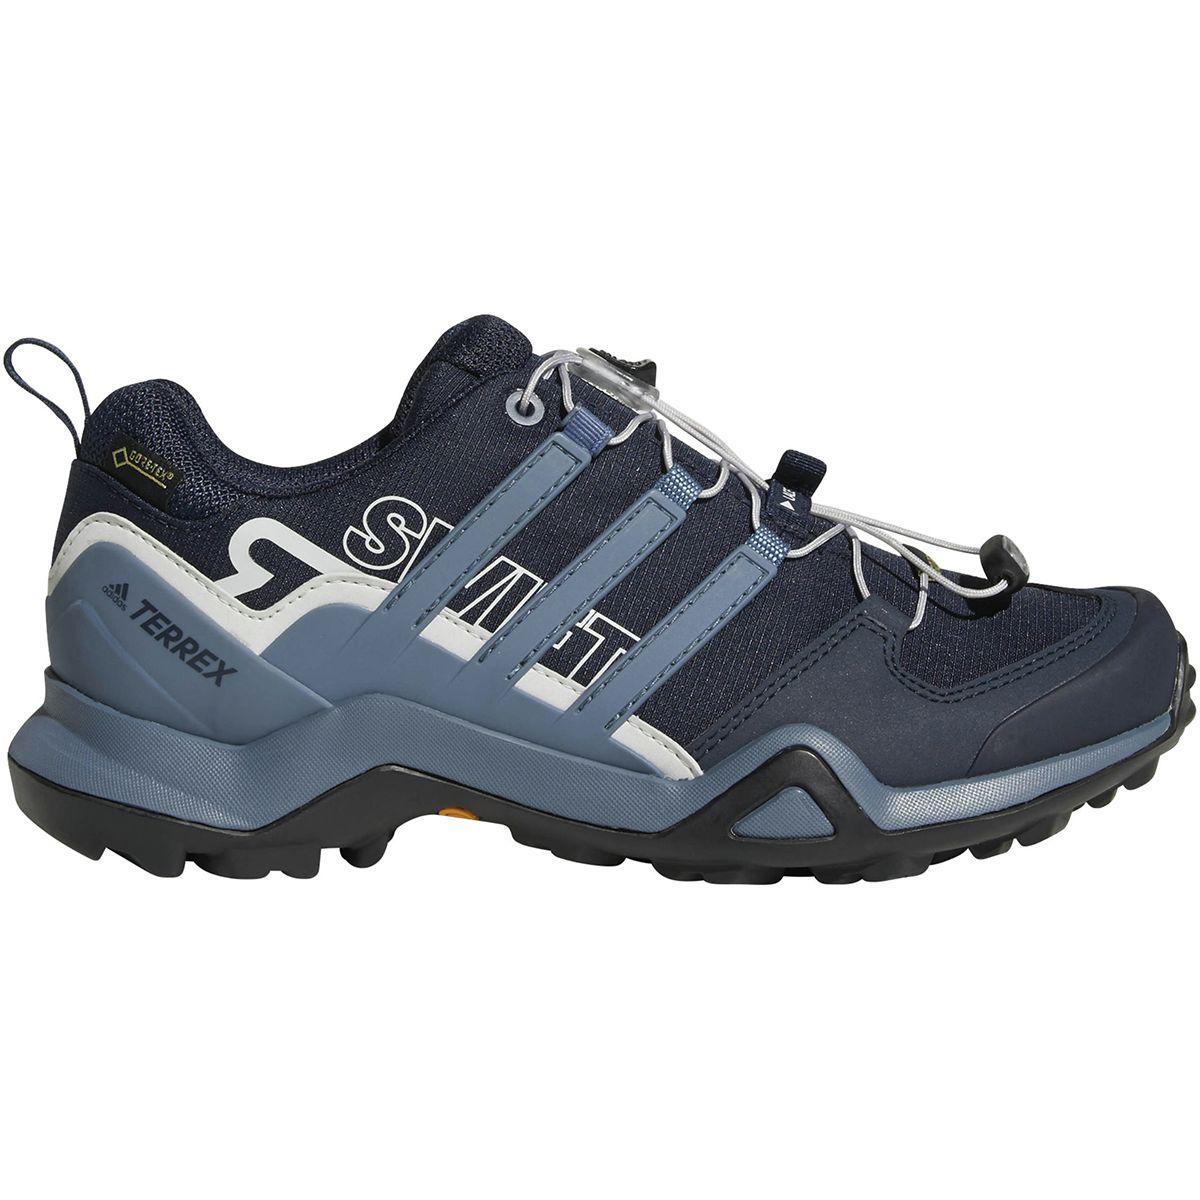 Adidas Outdoor Terrex Swift R Gtx Hiking Shoe Womens